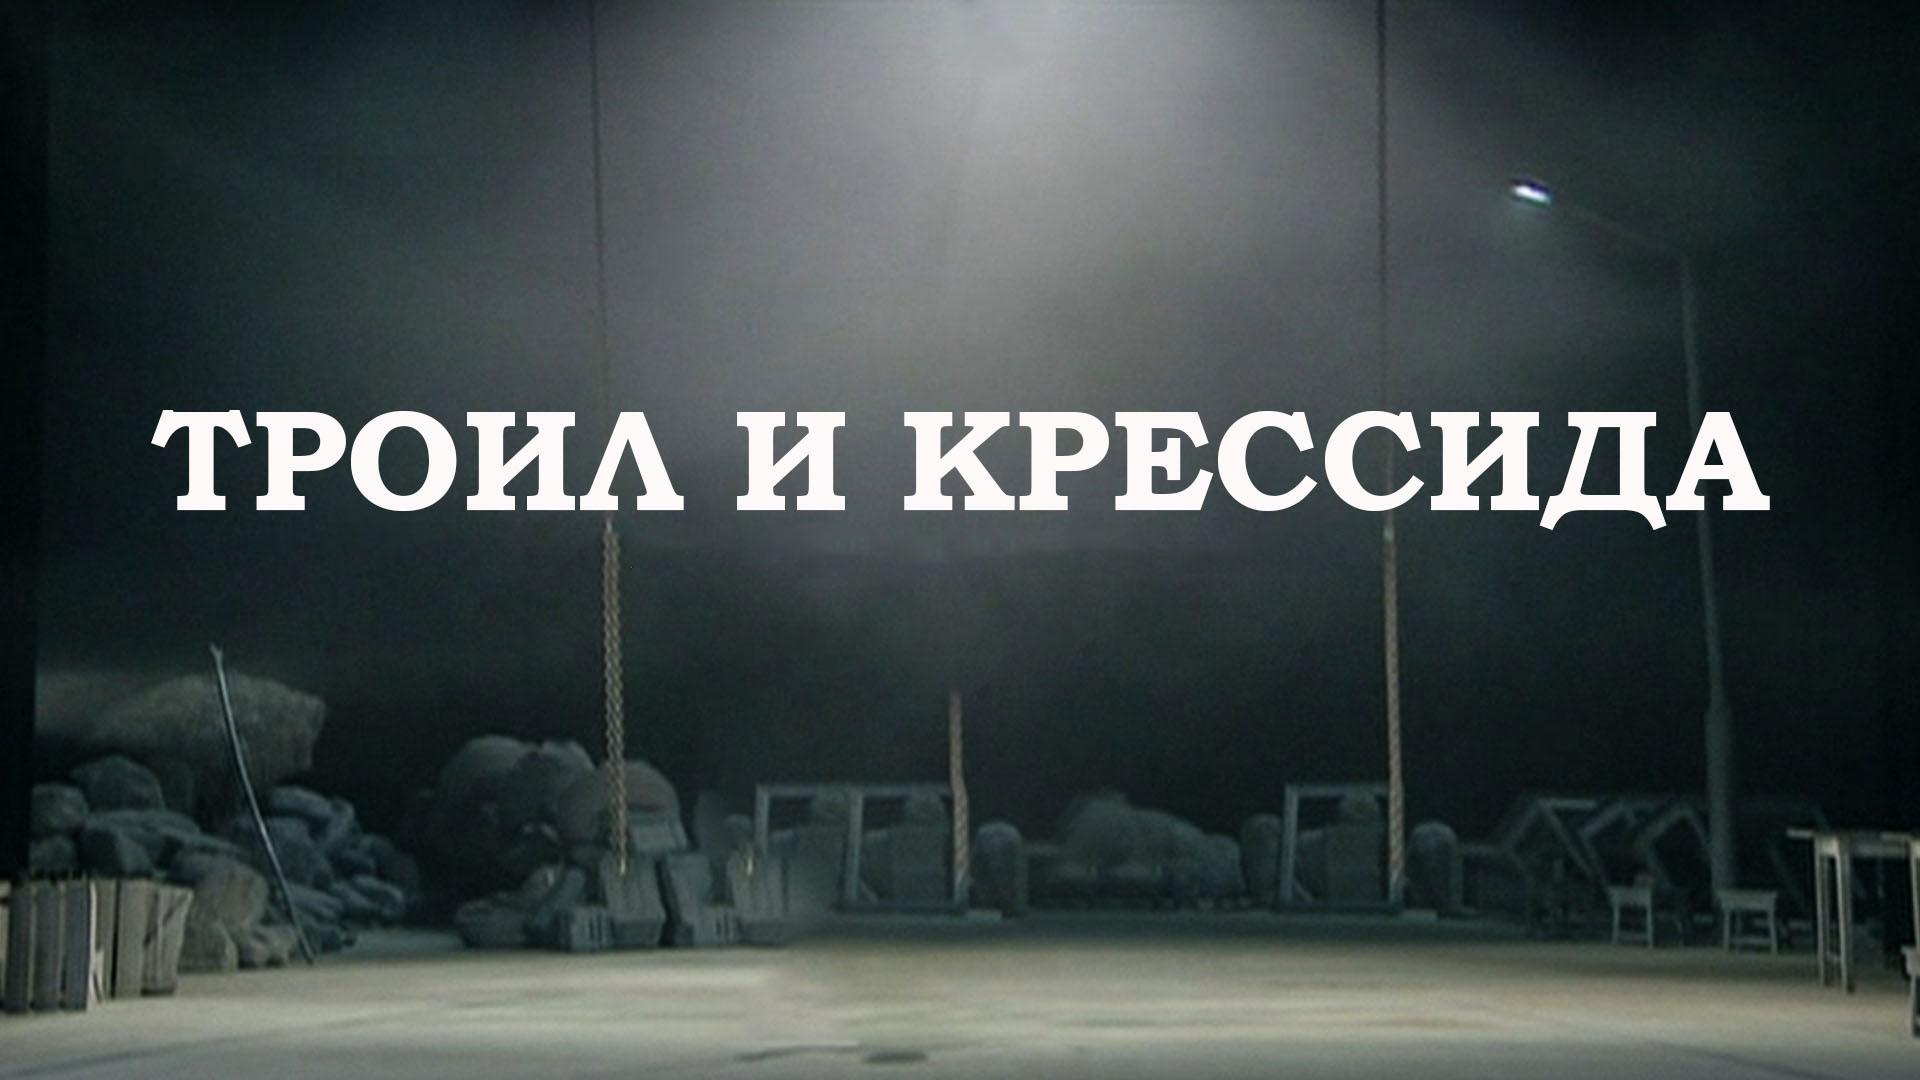 Троил и Крессида (Театр им. Евг. Вахтангова)